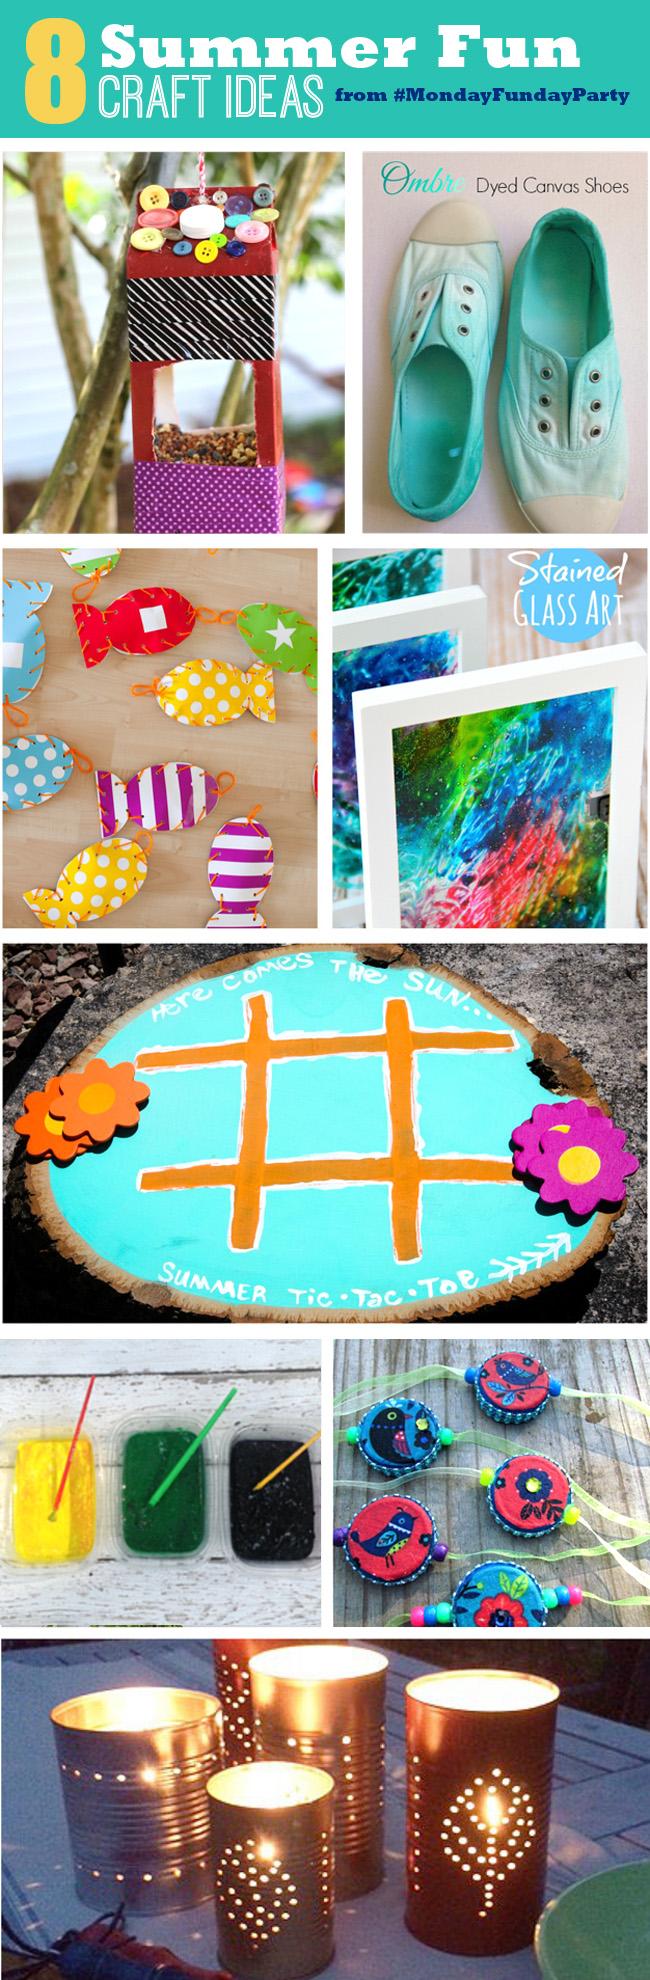 8 Summer Fun Craft Ideas #MondayFundayParty